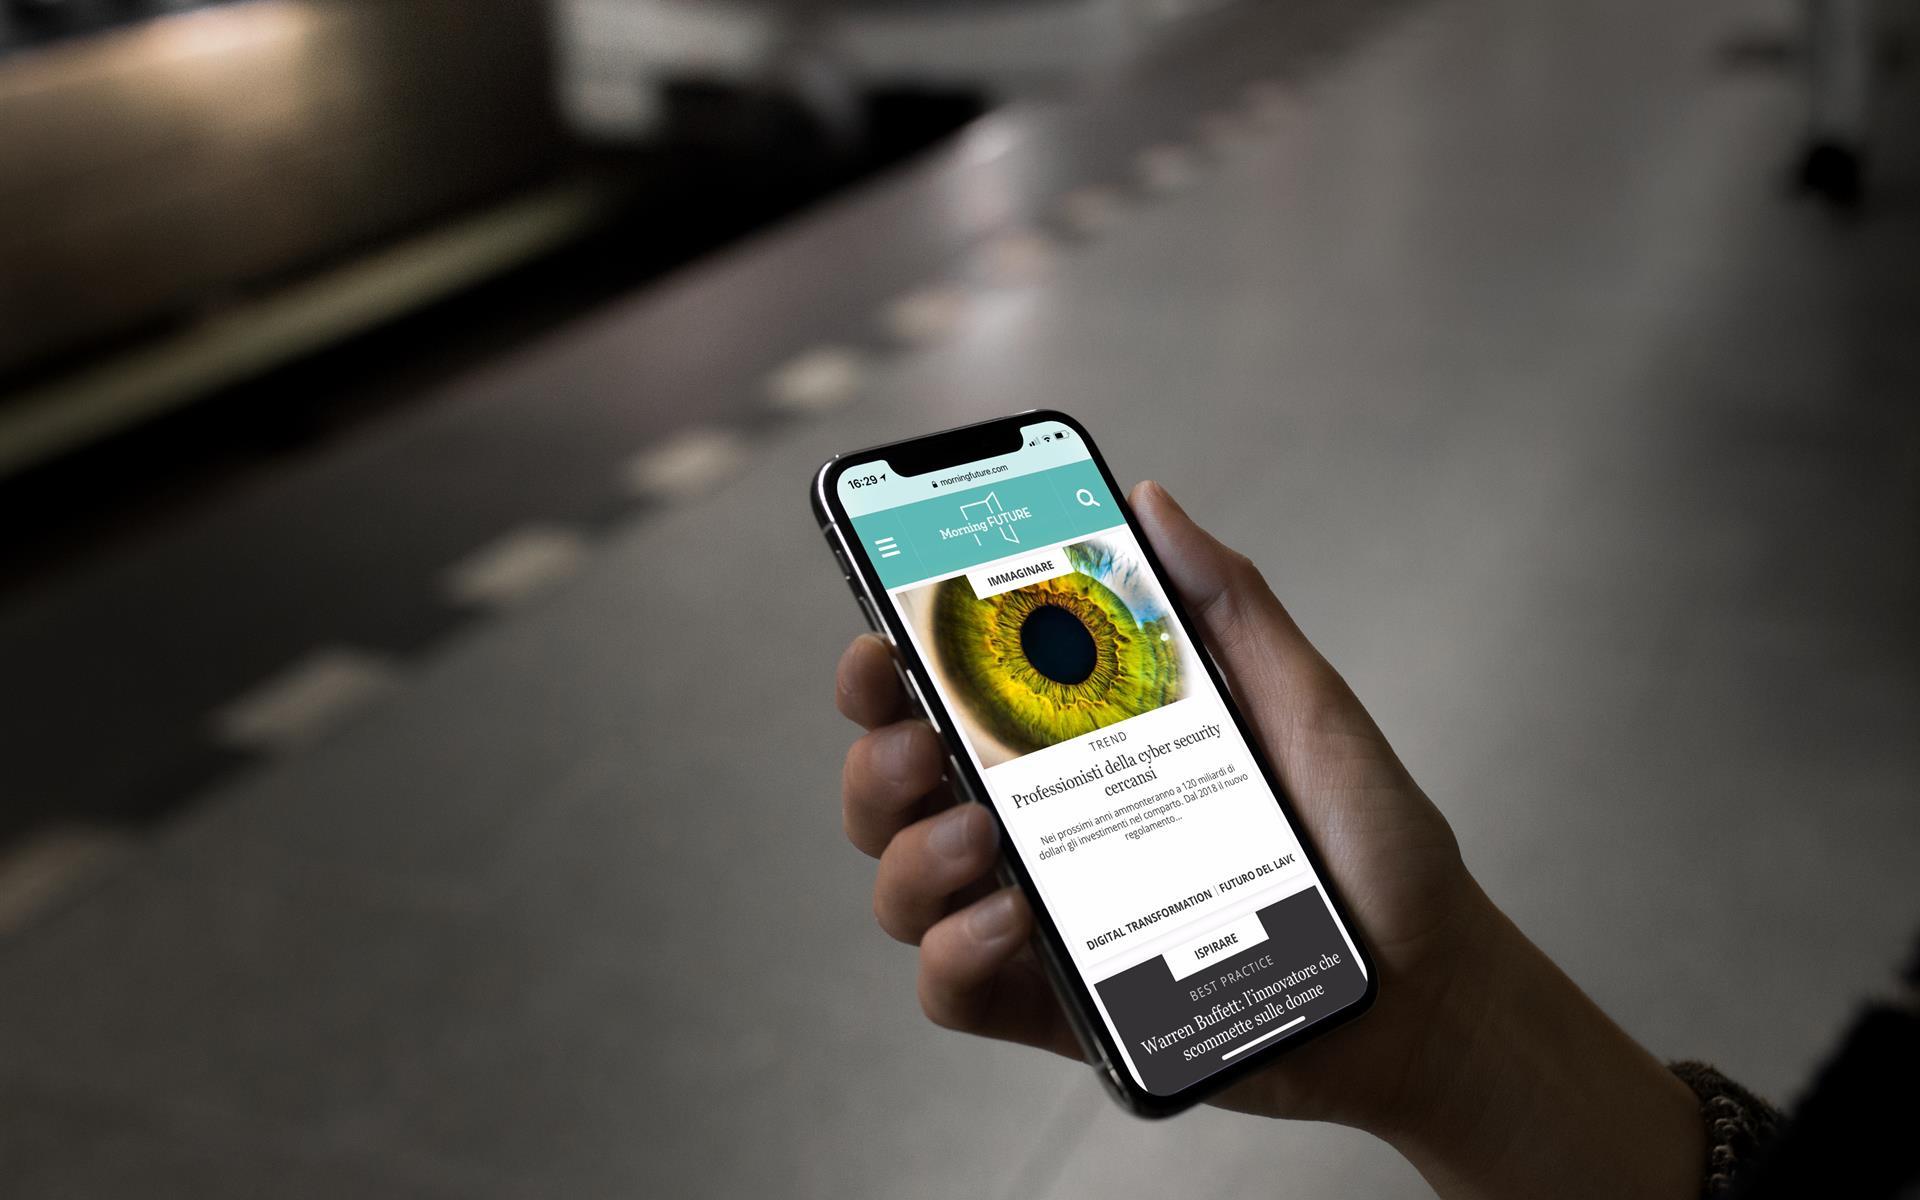 Iphone X In The Underground